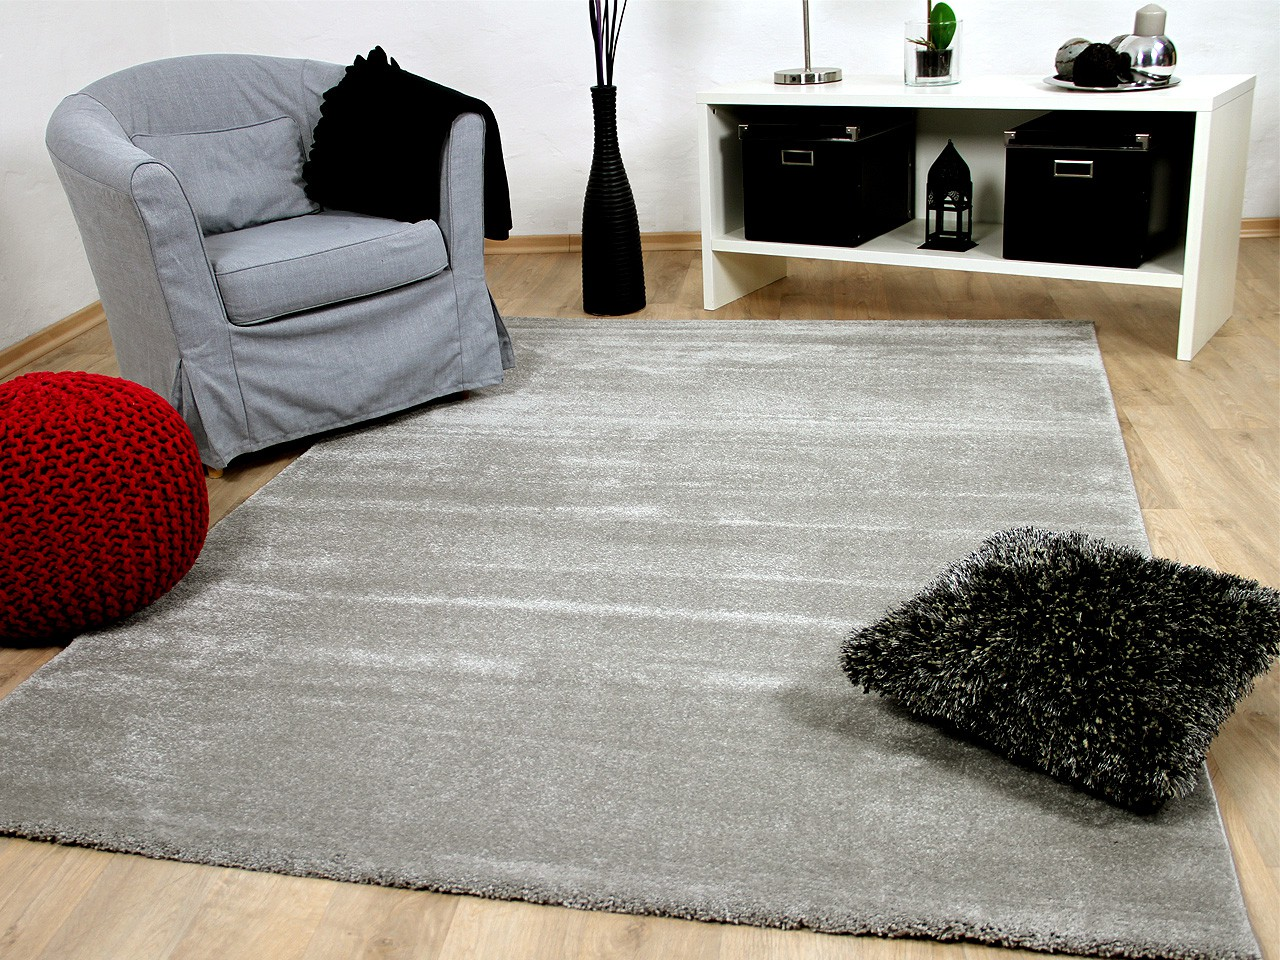 luxus soft velours teppich gala grau teppiche hochflor. Black Bedroom Furniture Sets. Home Design Ideas